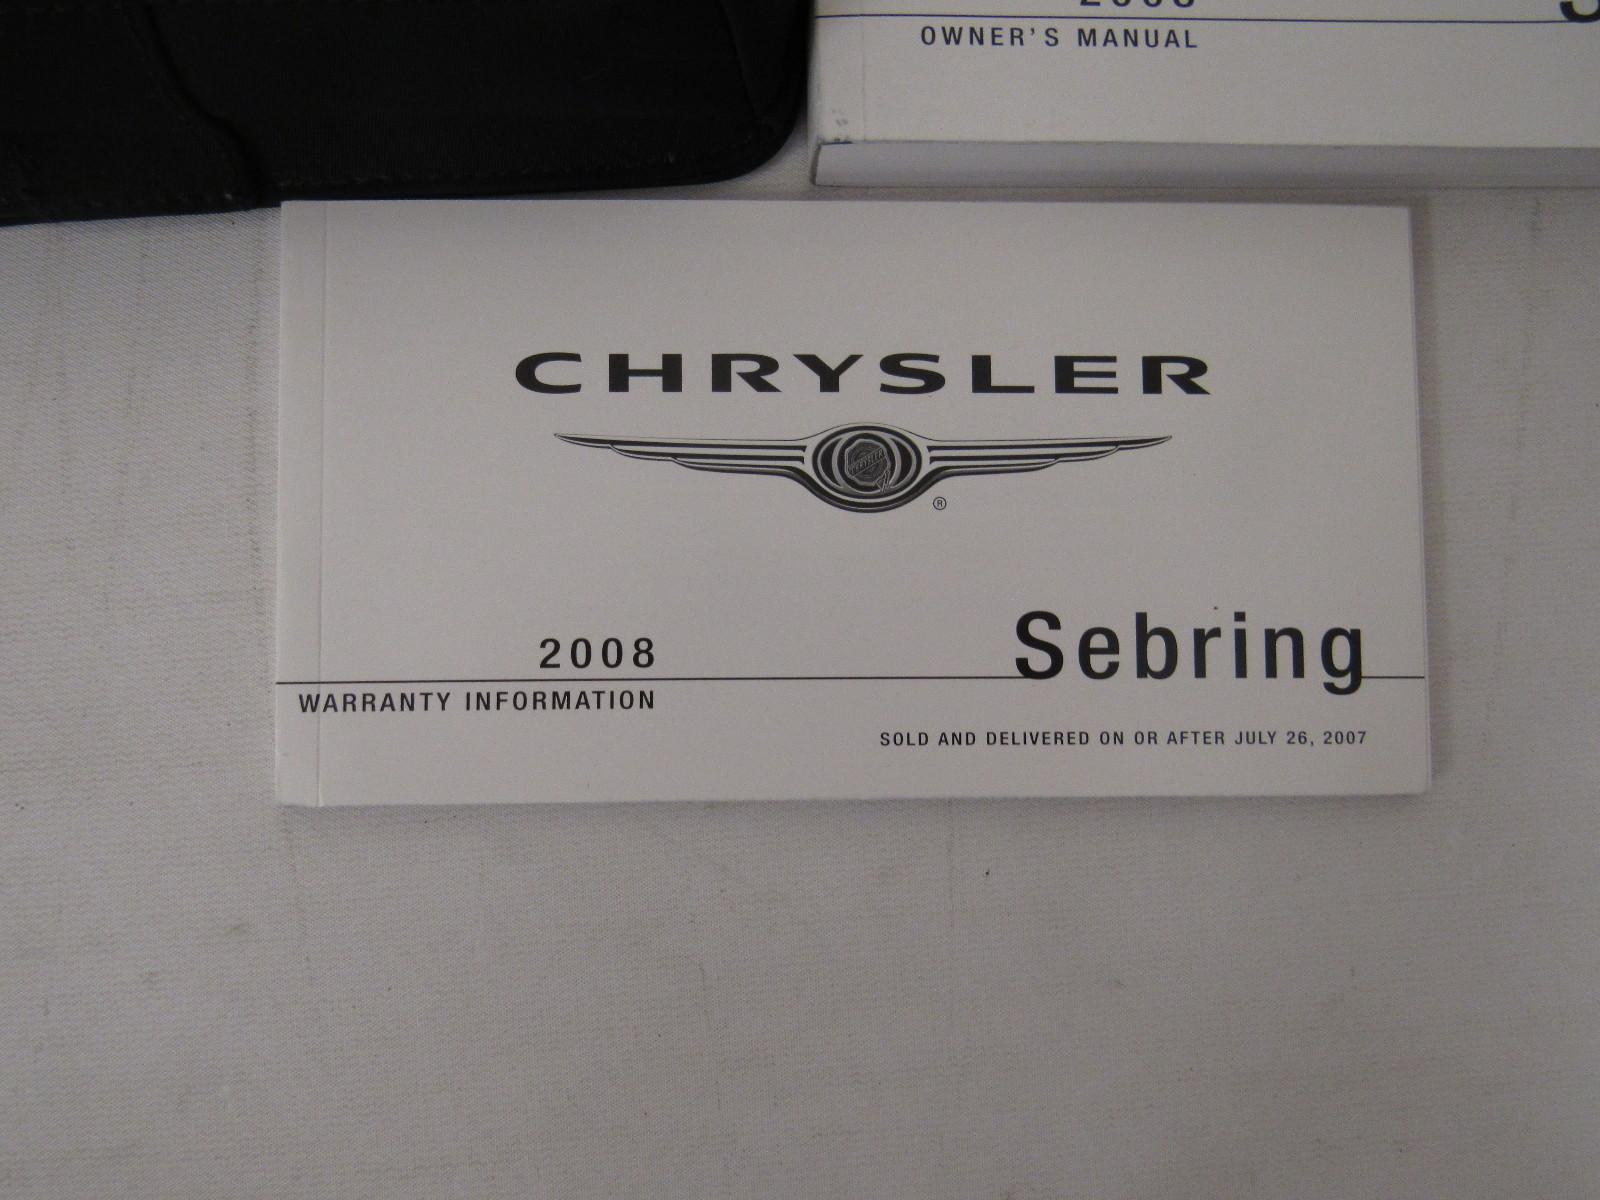 2008 chrysler sebring owners manual book bashful yak rh bashfulyak com chrysler sebring owners manual chrysler sebring owners manual 2008